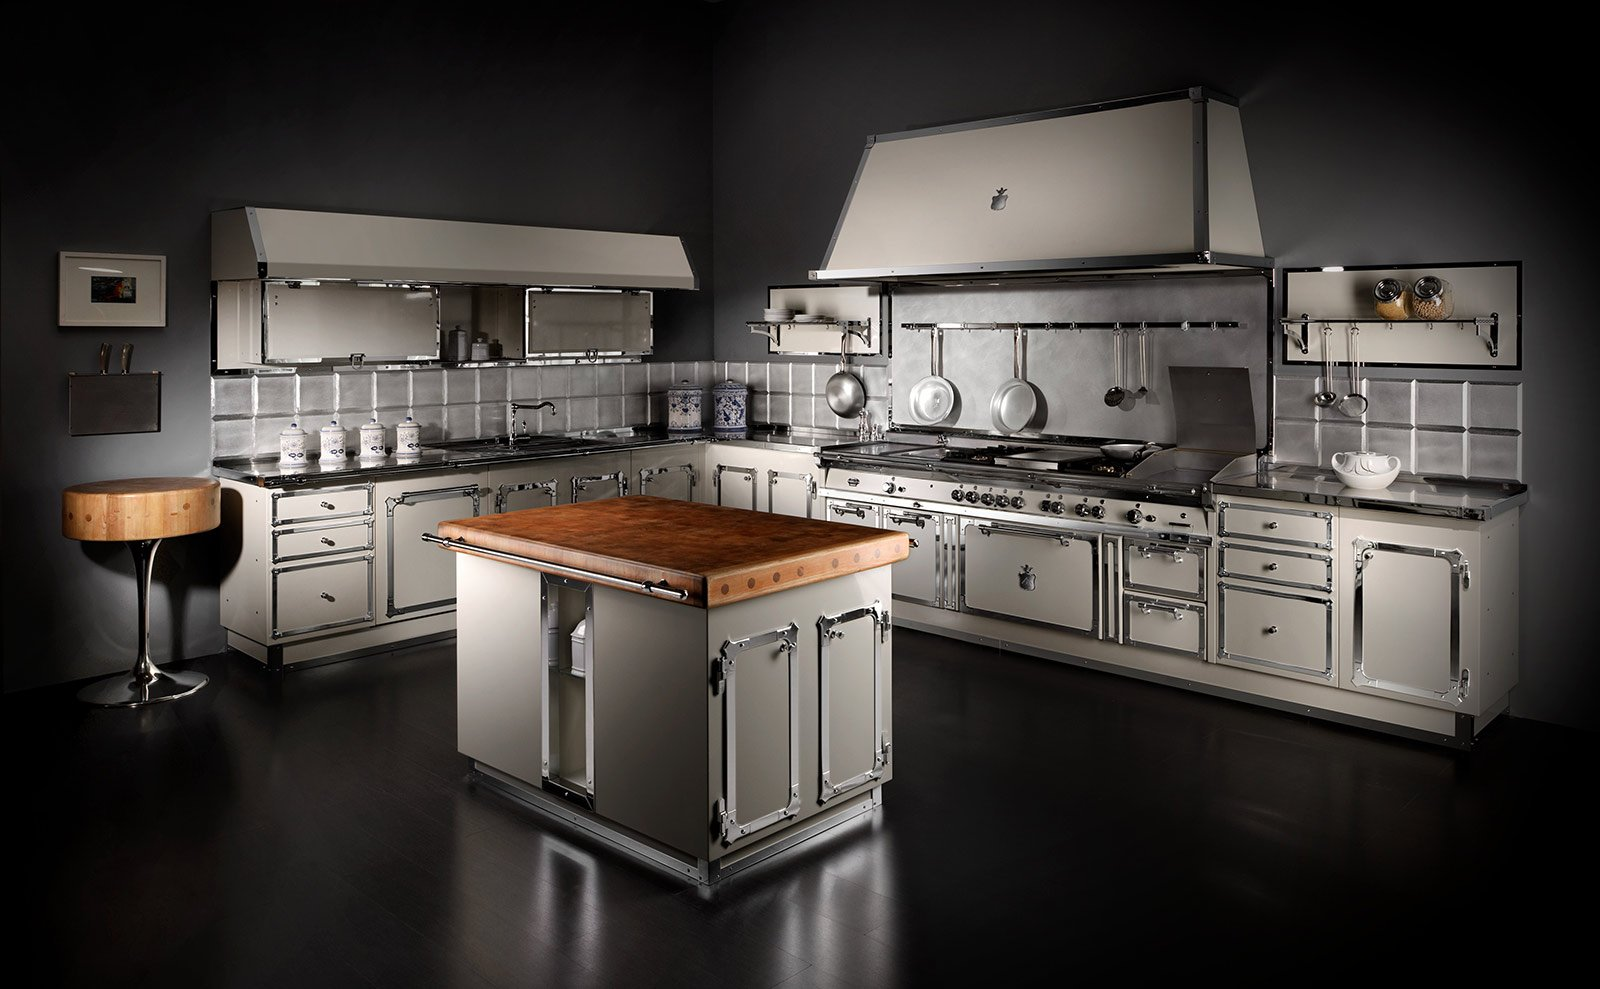 Cucina le soluzioni per l angolo cose di casa - Cucina per casa ...